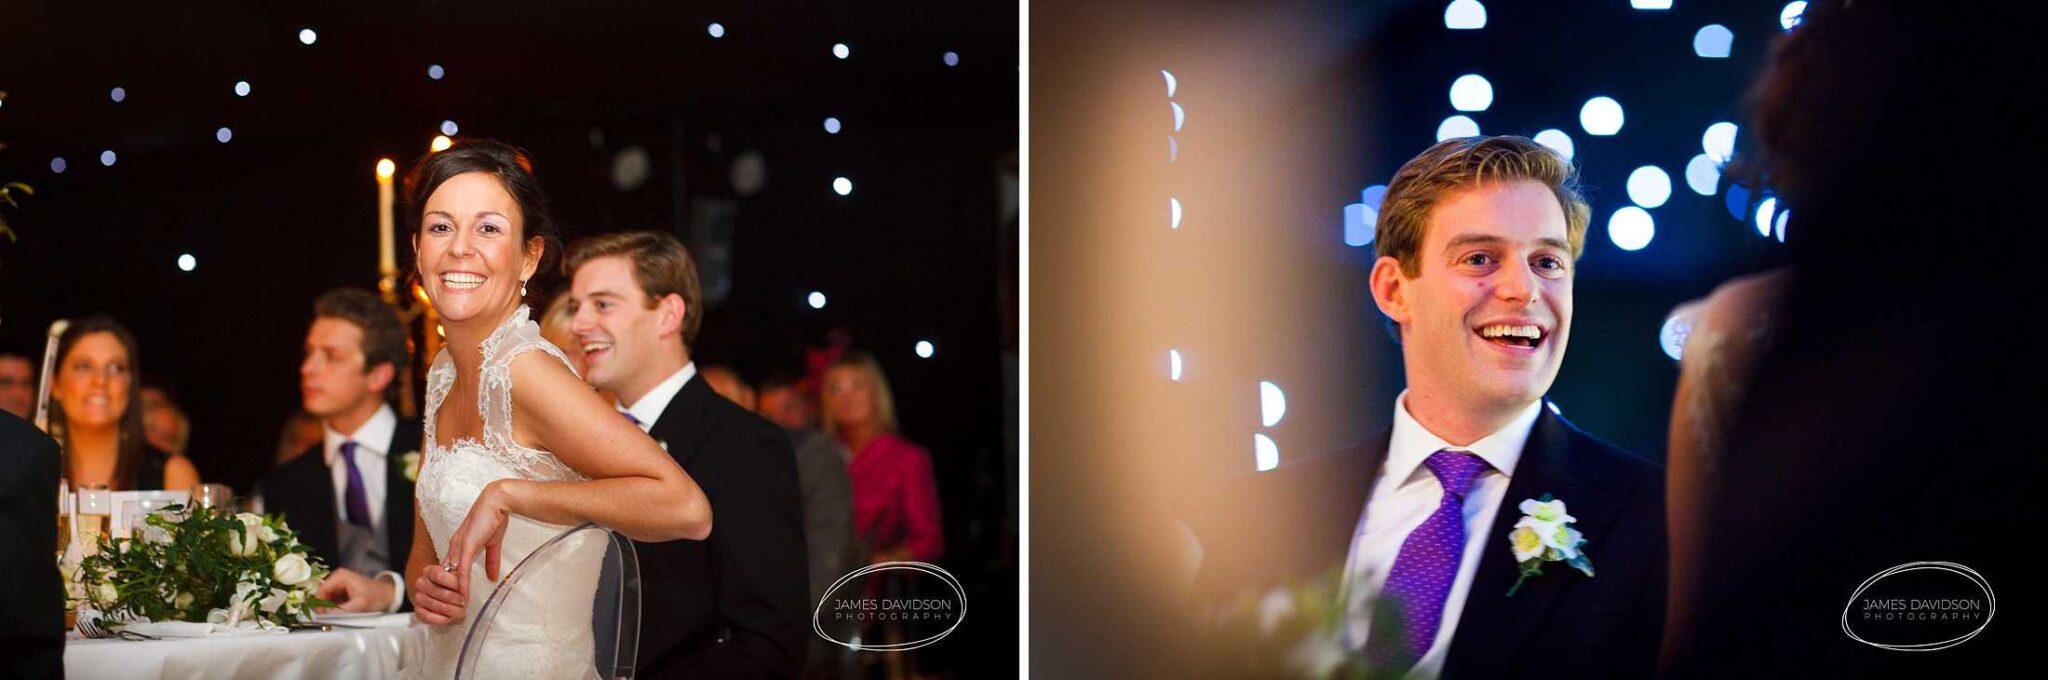 huddersfield-wedding-photography-032